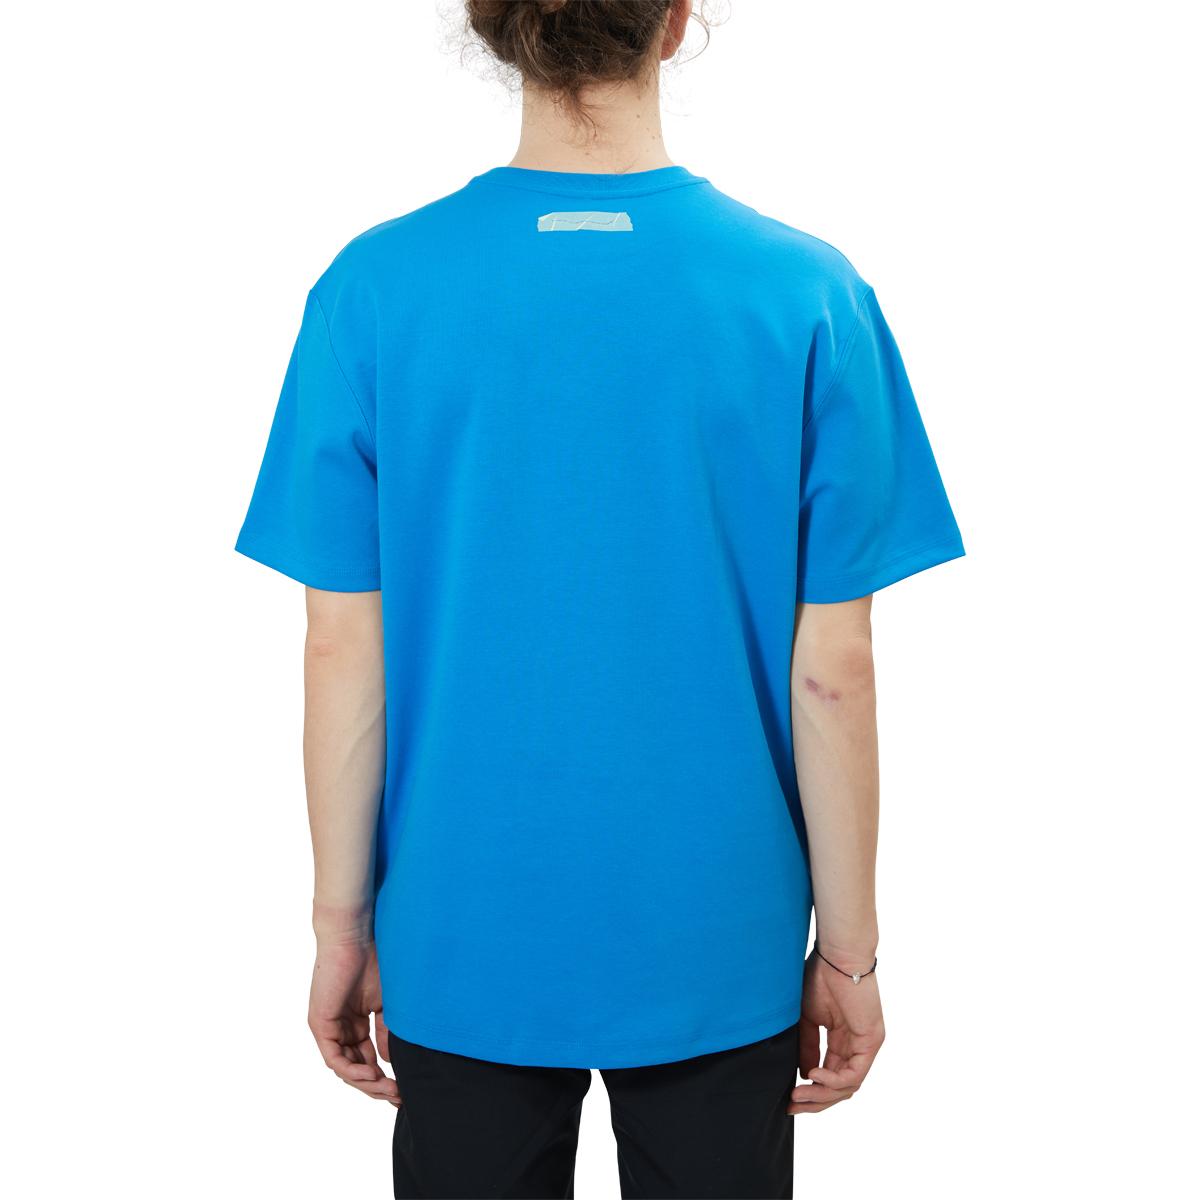 ADER Error Aspect T-Shirt